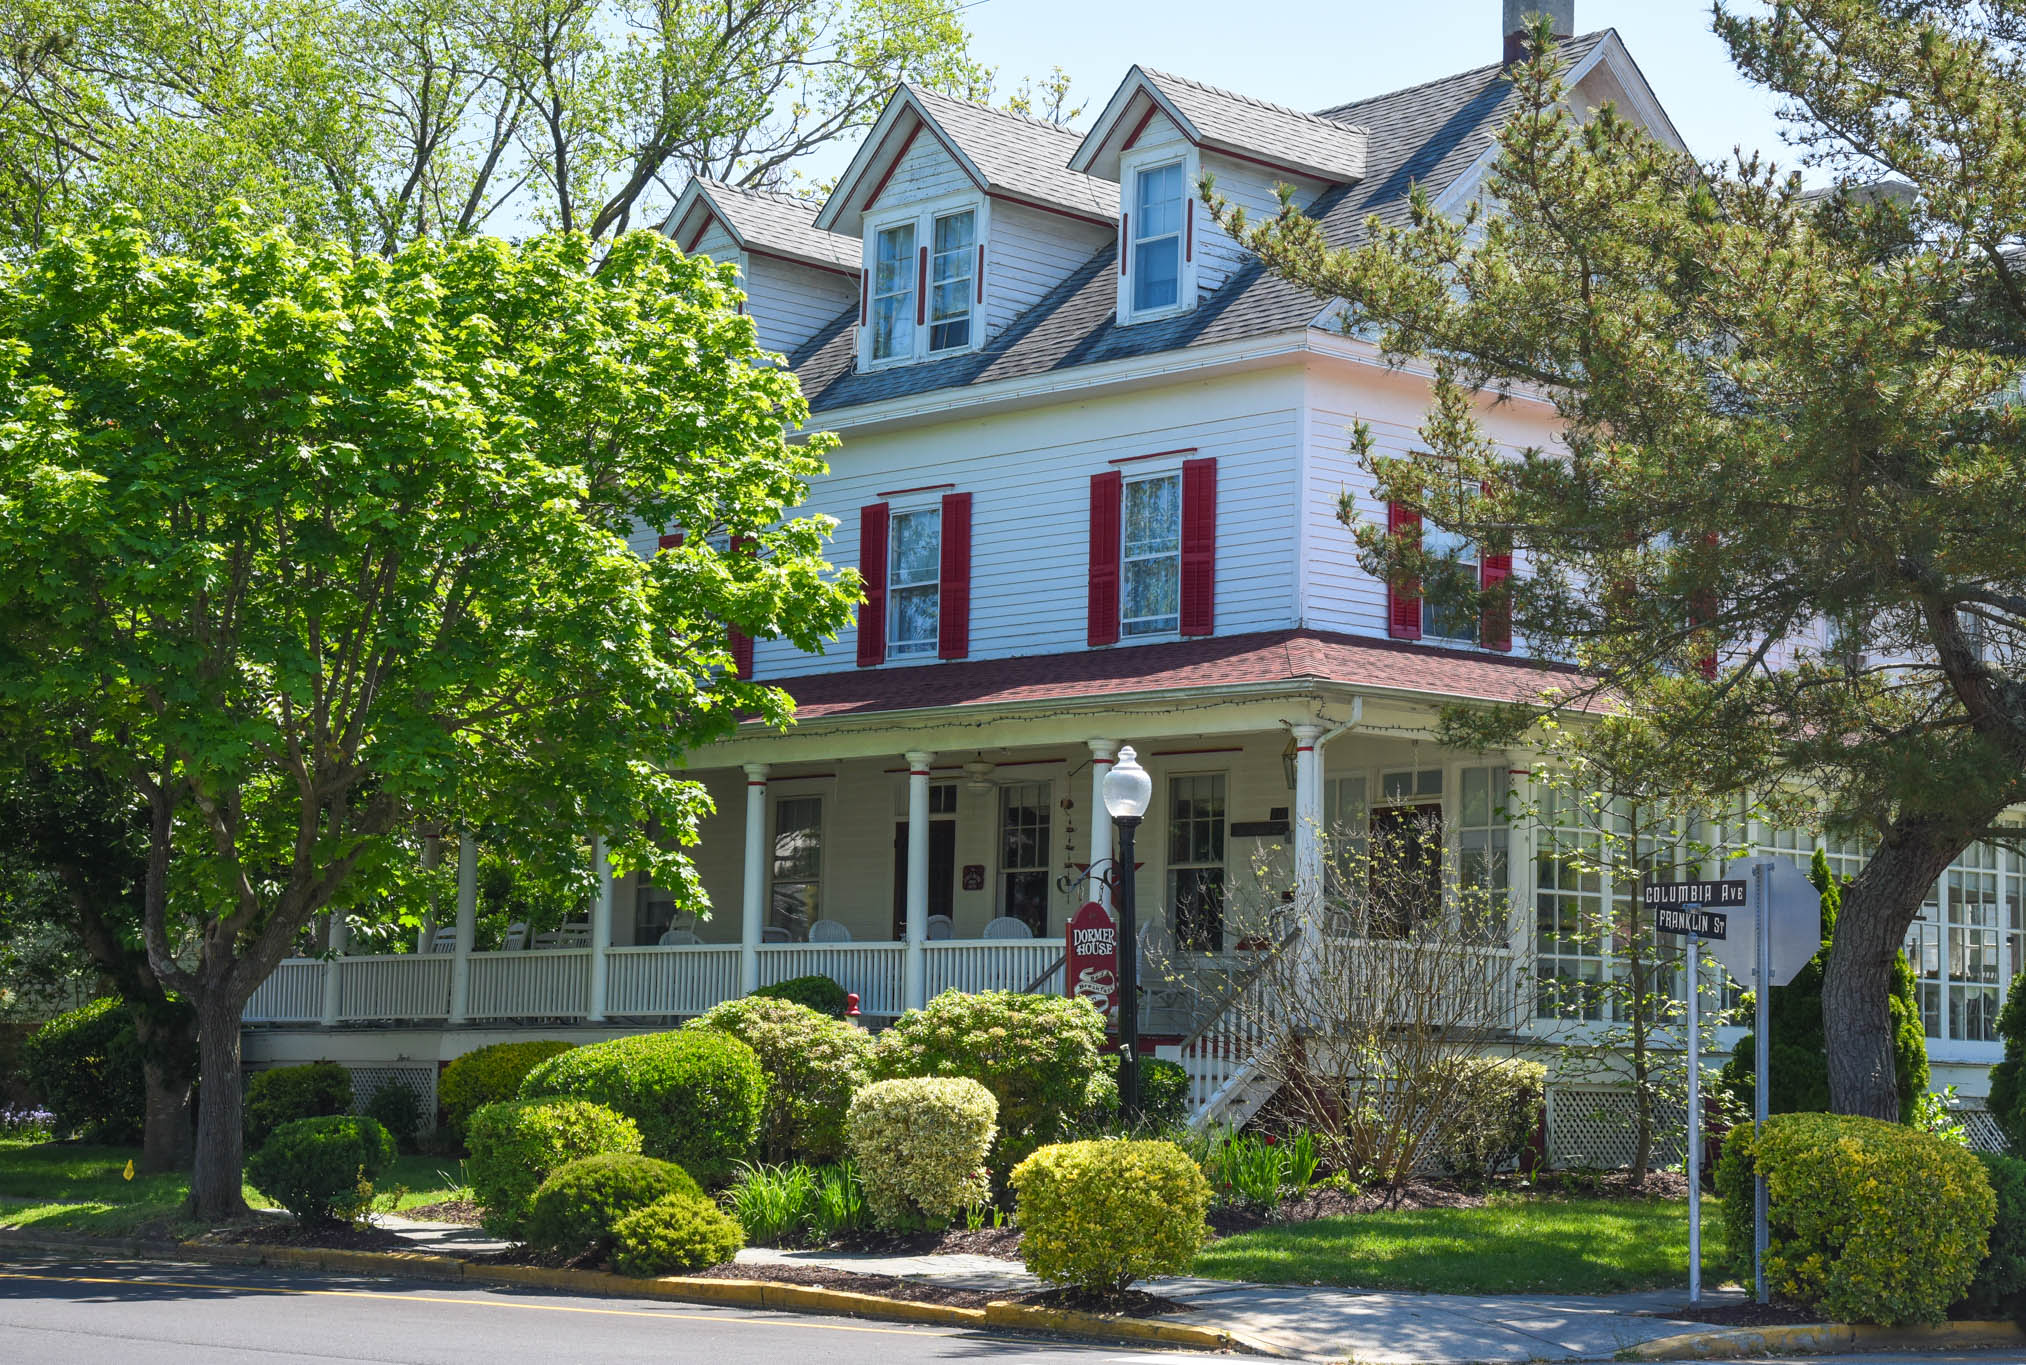 Dormer House on Columbia Ave